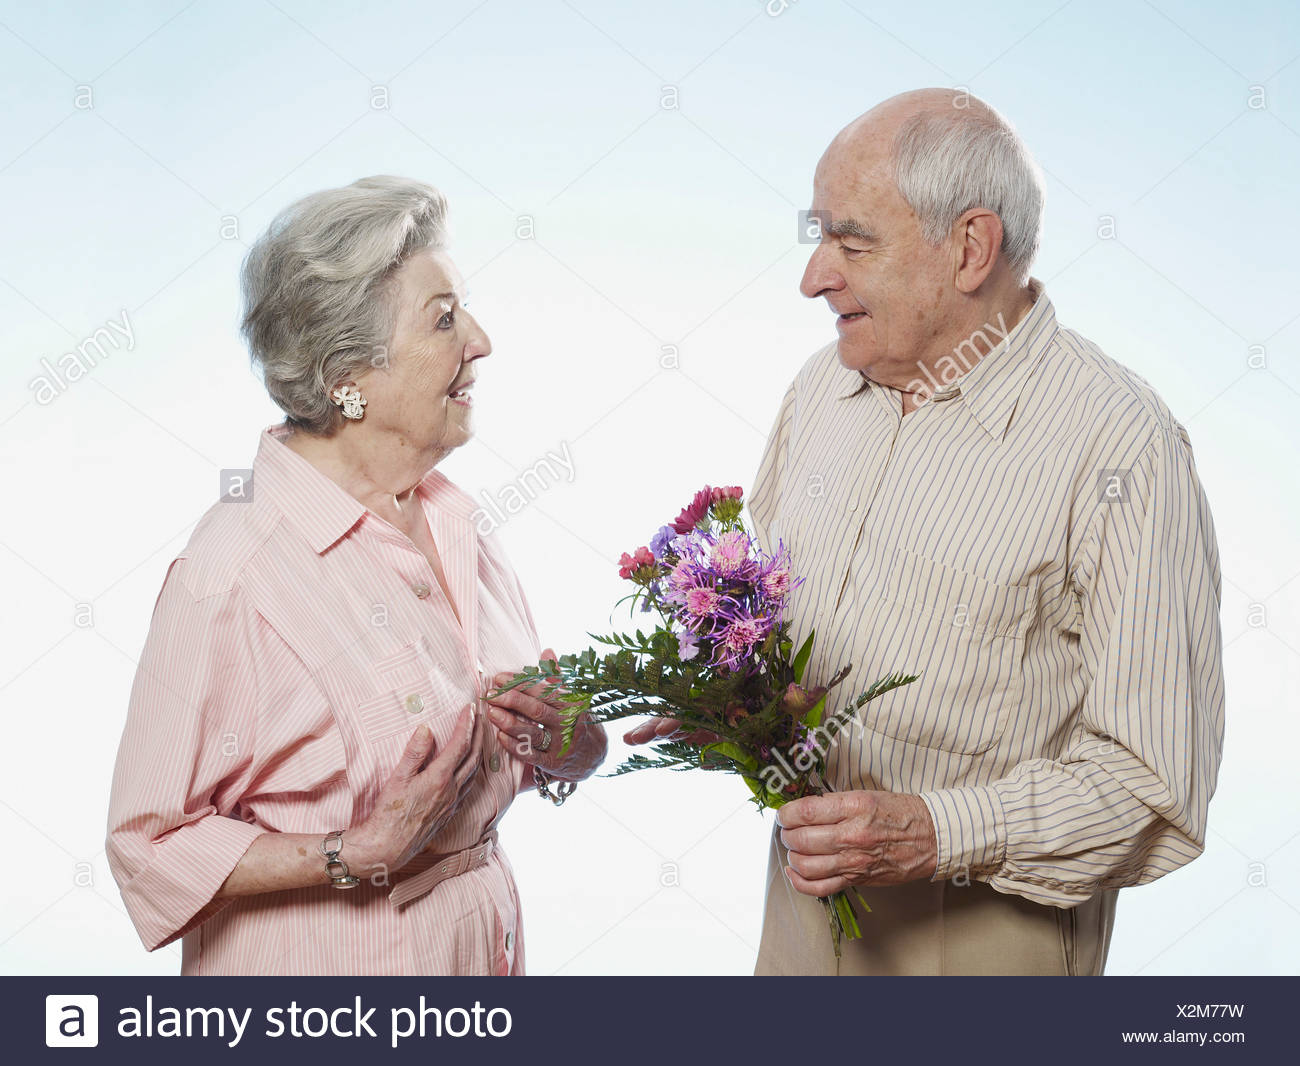 Senior man gives senior woman flowers Stock Photo